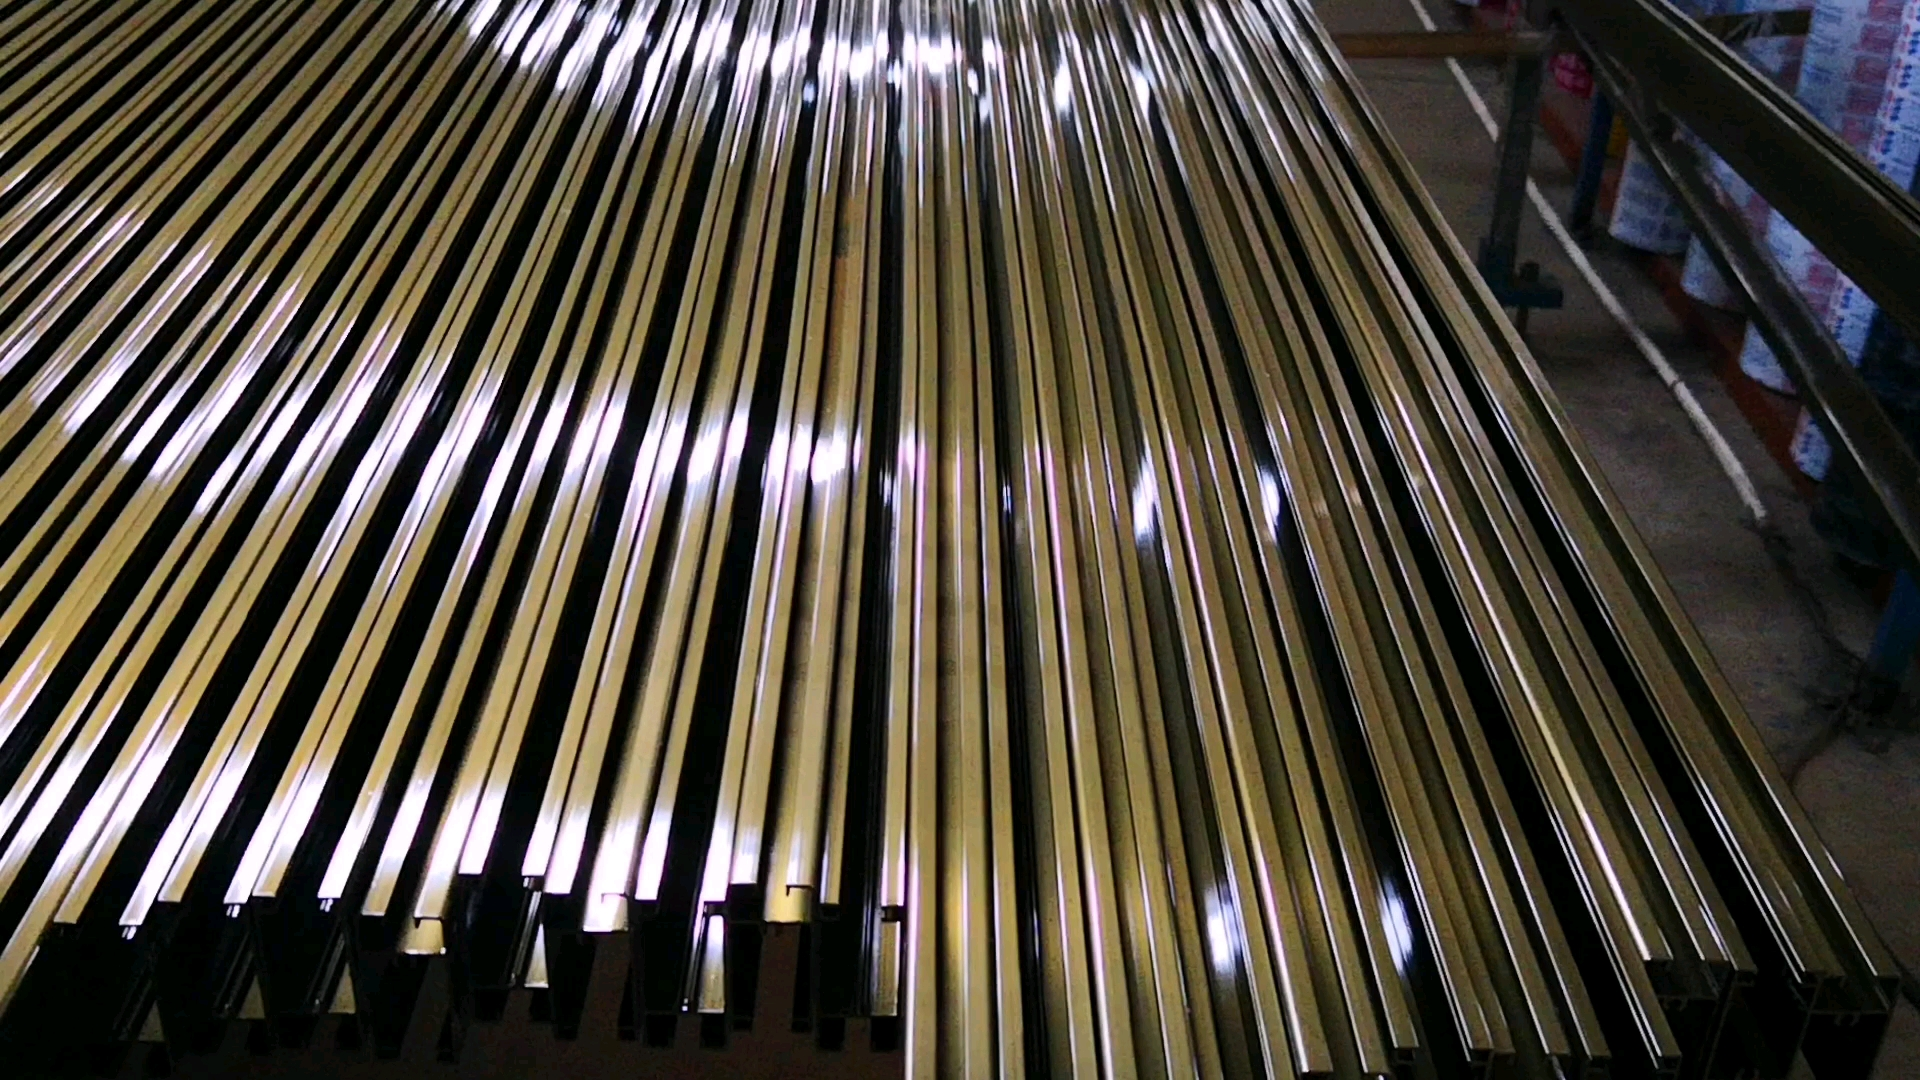 Fabriek oem 6000 serie geëxtrudeerd aluminium deur en raam frames/aluminium schuifraam frame